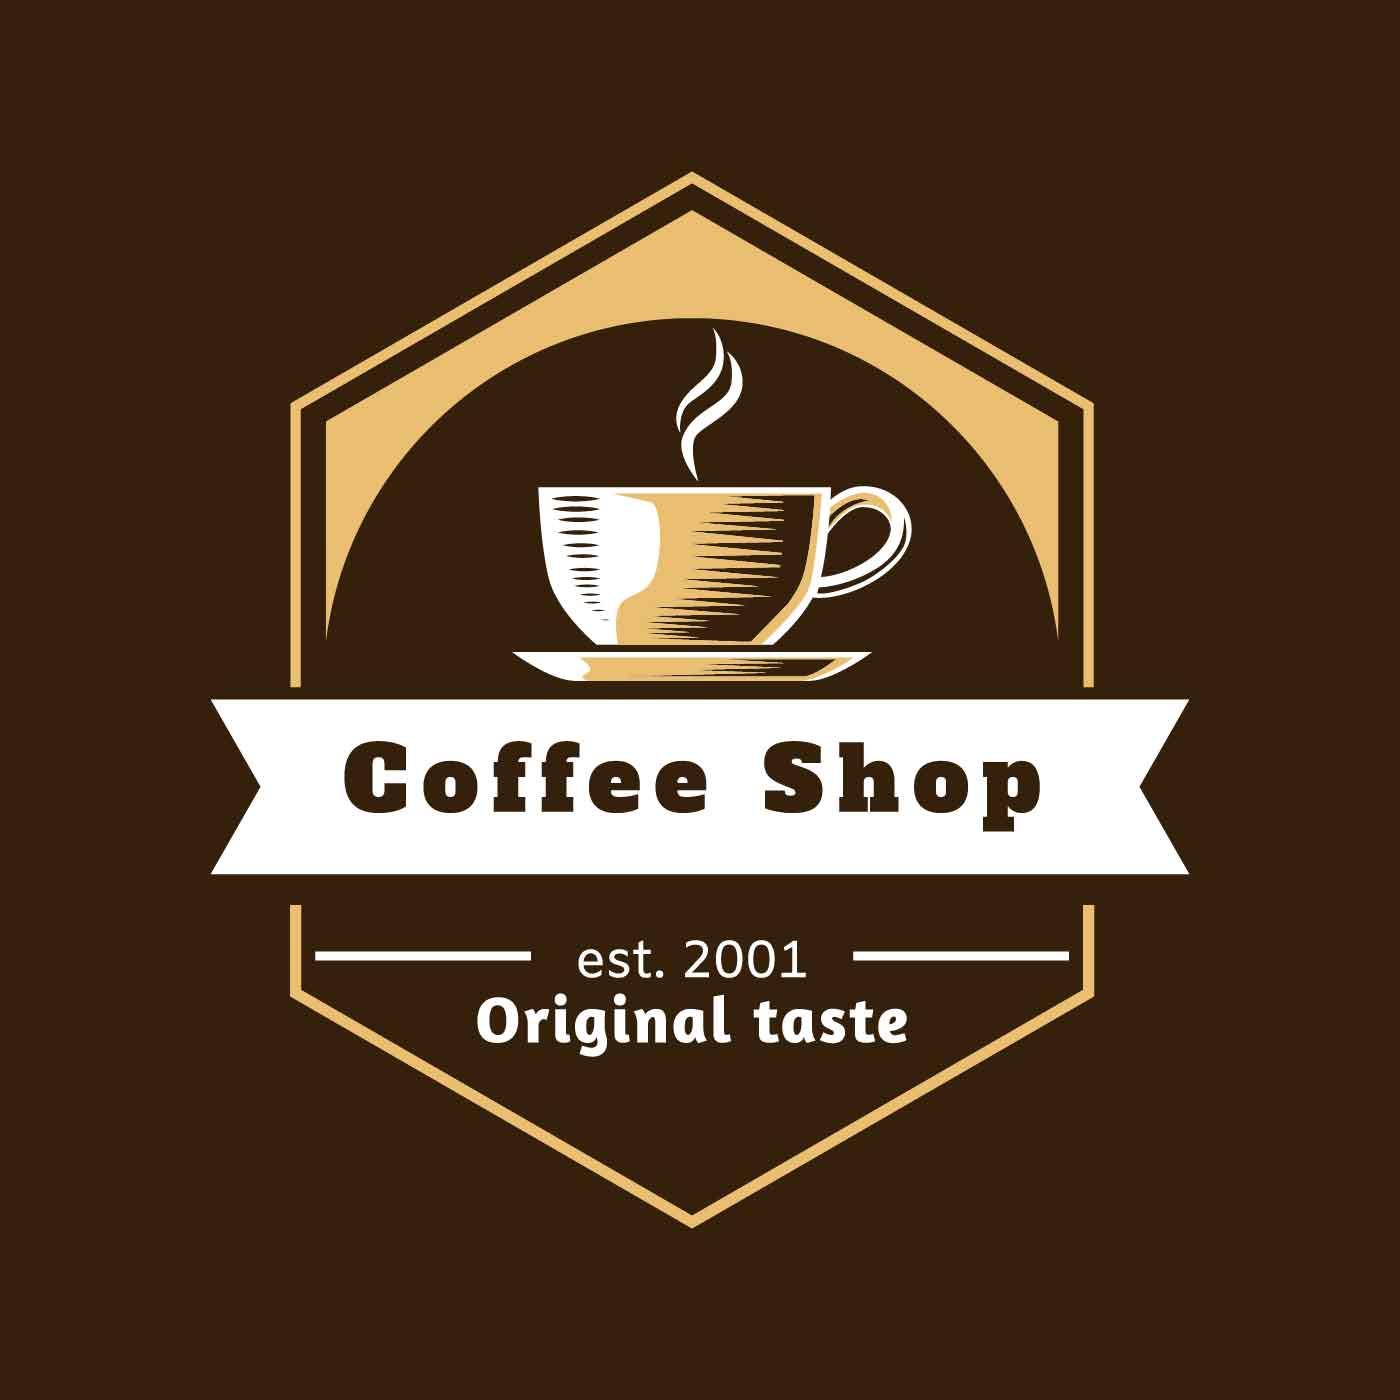 Coffee Shop Logo Vector Download Free Vector Art Stock Graphics